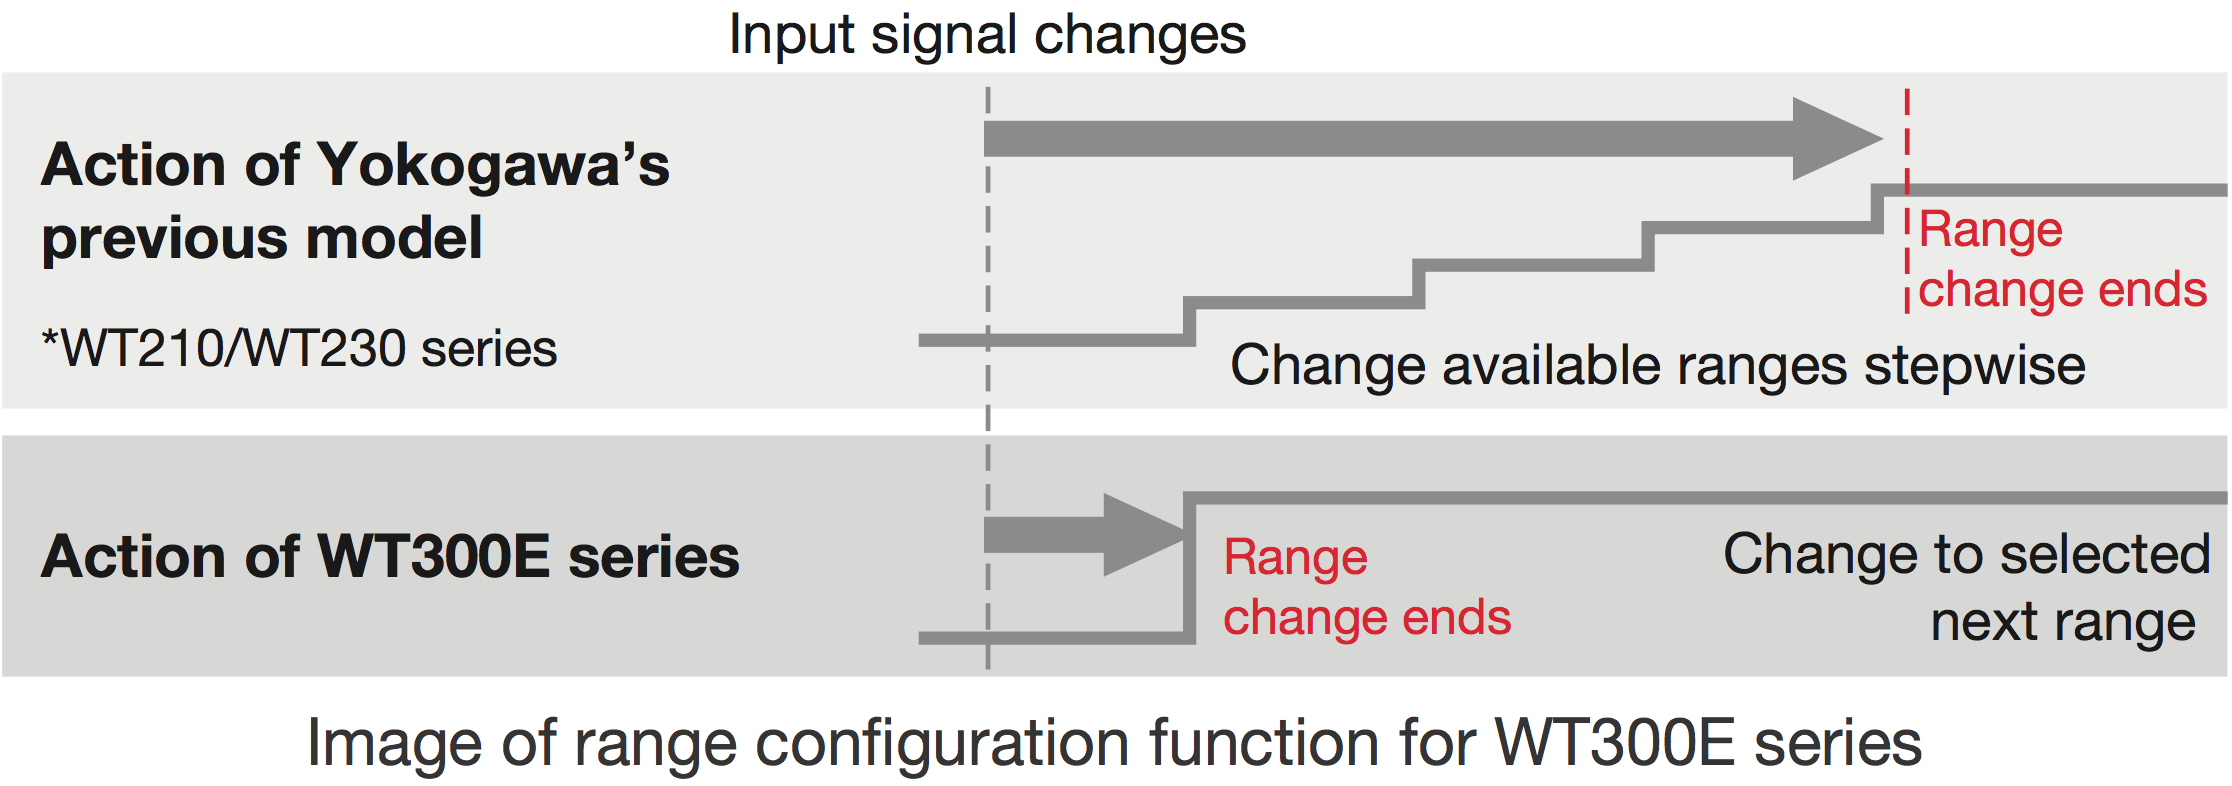 3_Input_Signal_Changes